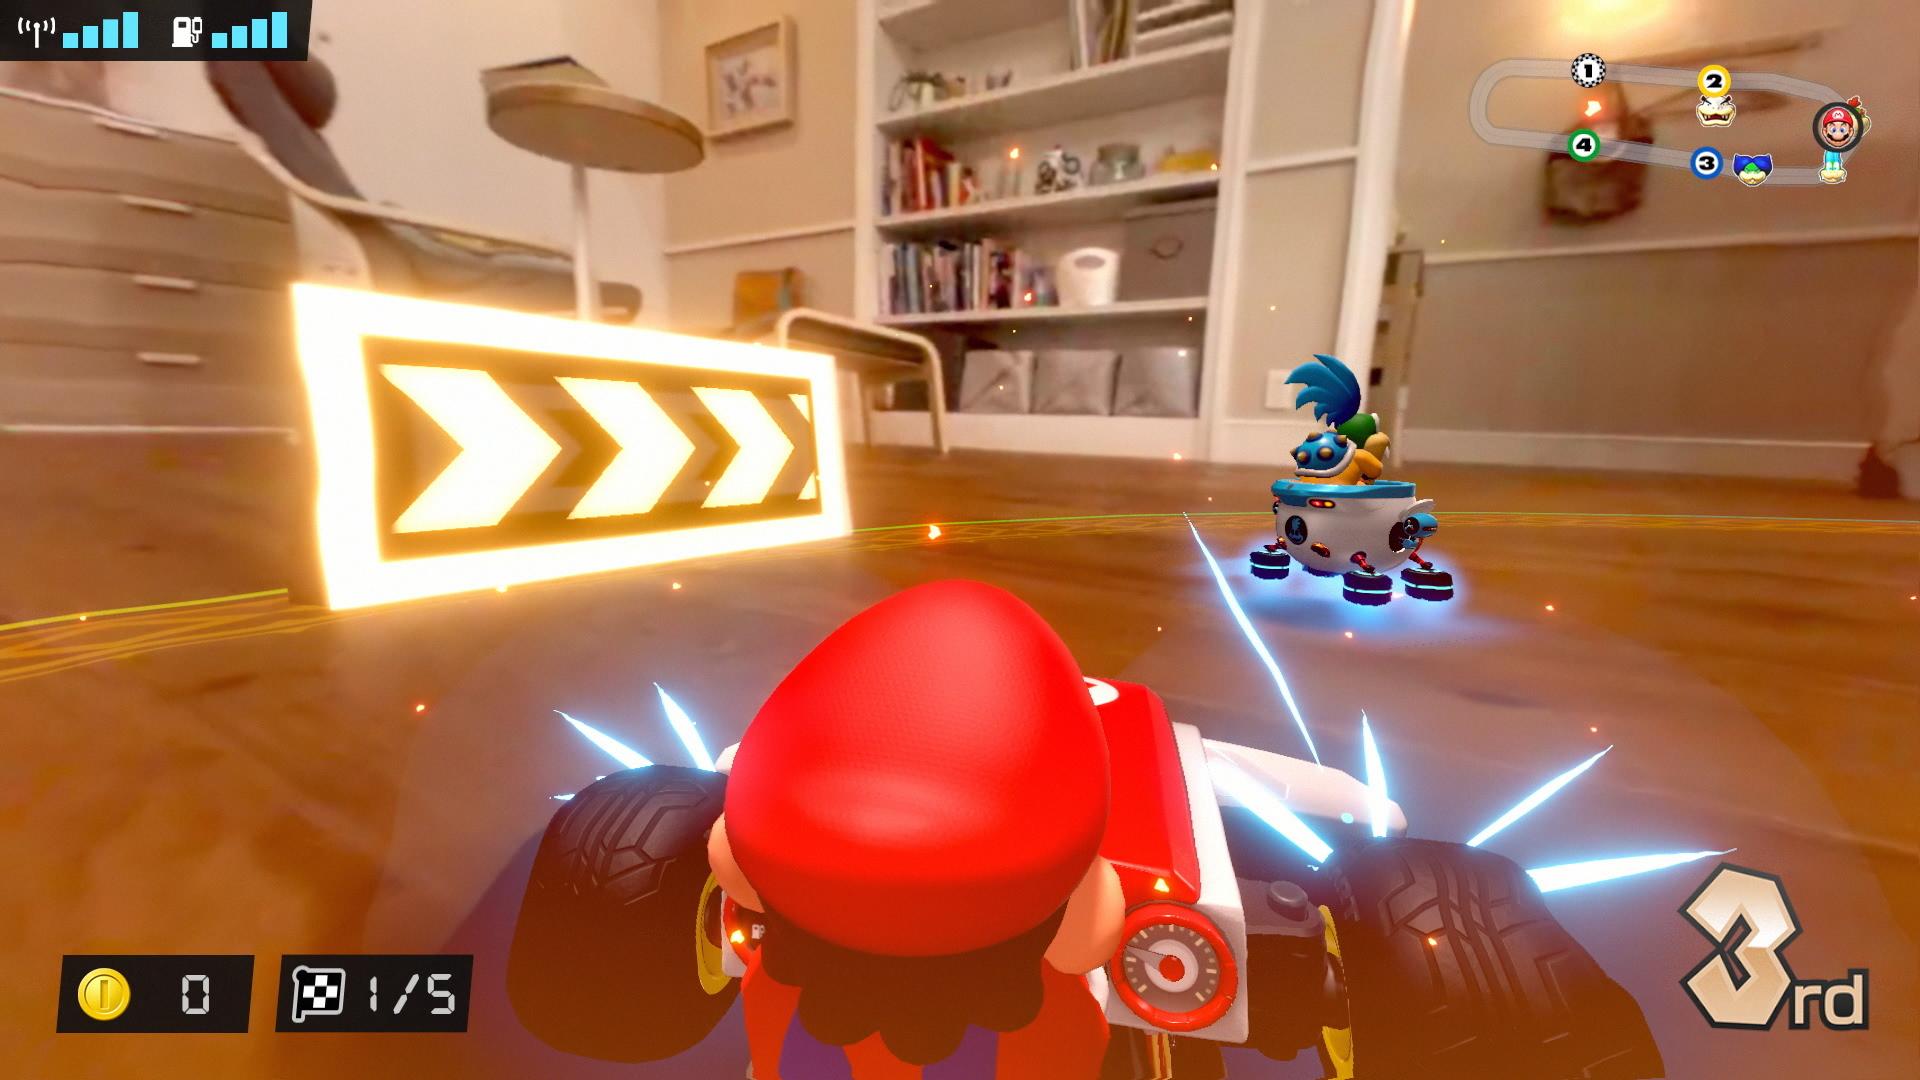 A screenshot from Mario Kart Live: Home Circuit